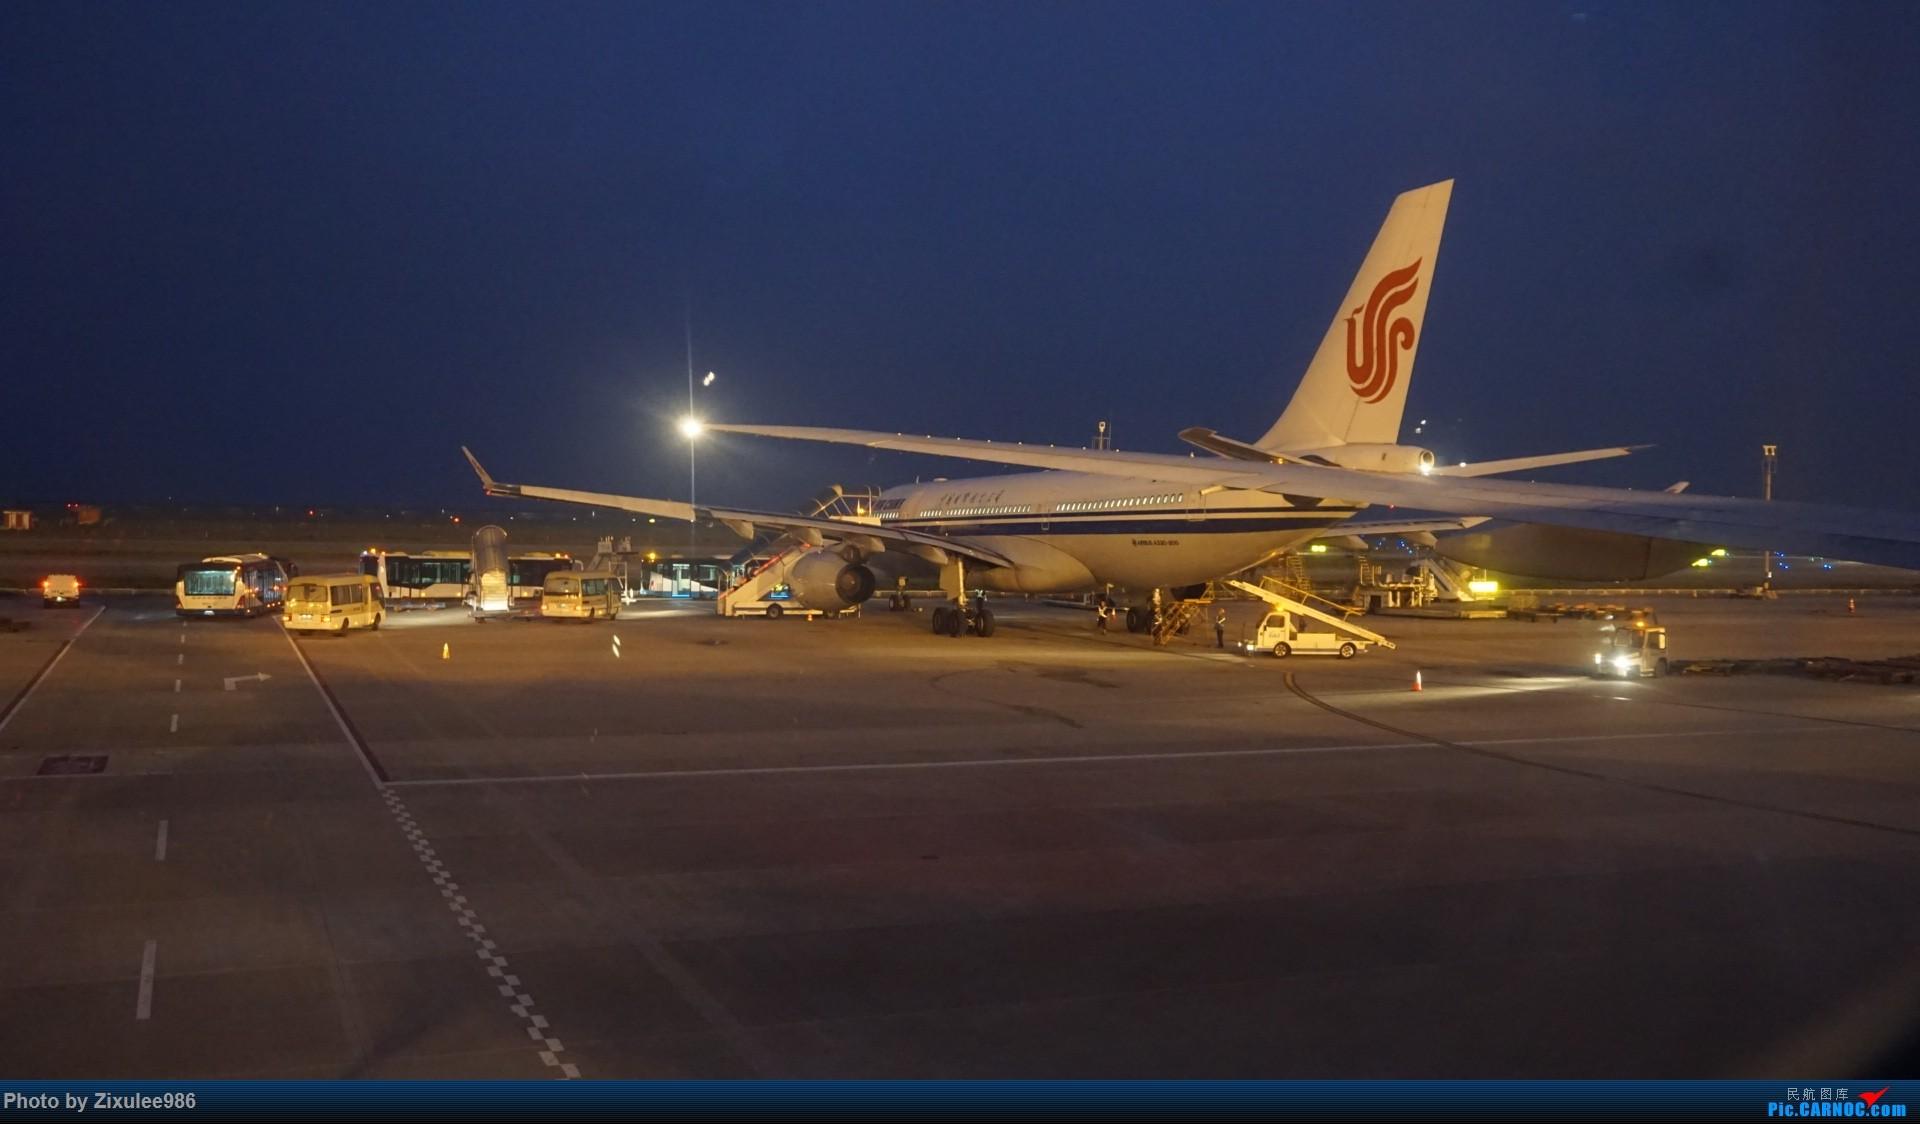 Re:[原创]加拿大21日游学之旅 (二)~加航AC28..PVG-YYZ到达多村后的雨天~多图缓更,请各位大侠谅解~ AIRBUS A330-200 B-5927 中国上海浦东国际机场